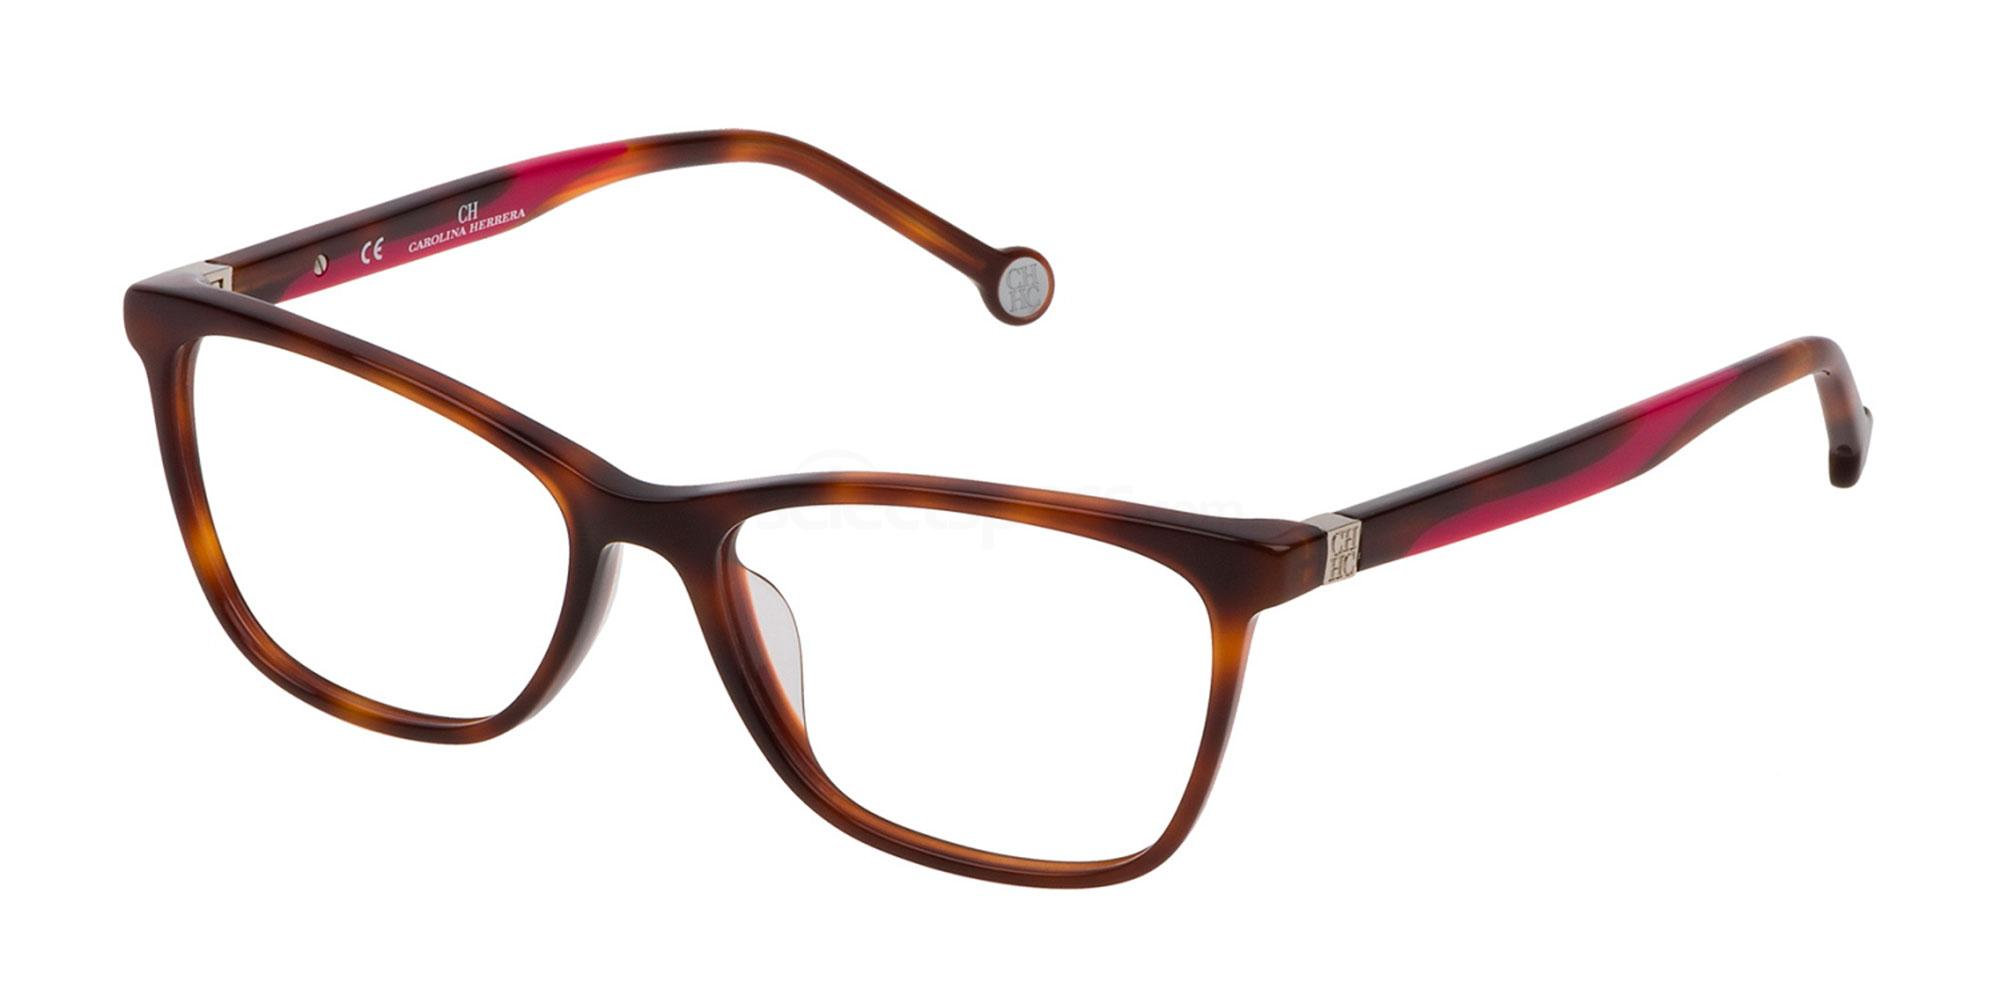 0752 VHE771 Glasses, CH Carolina Herrera